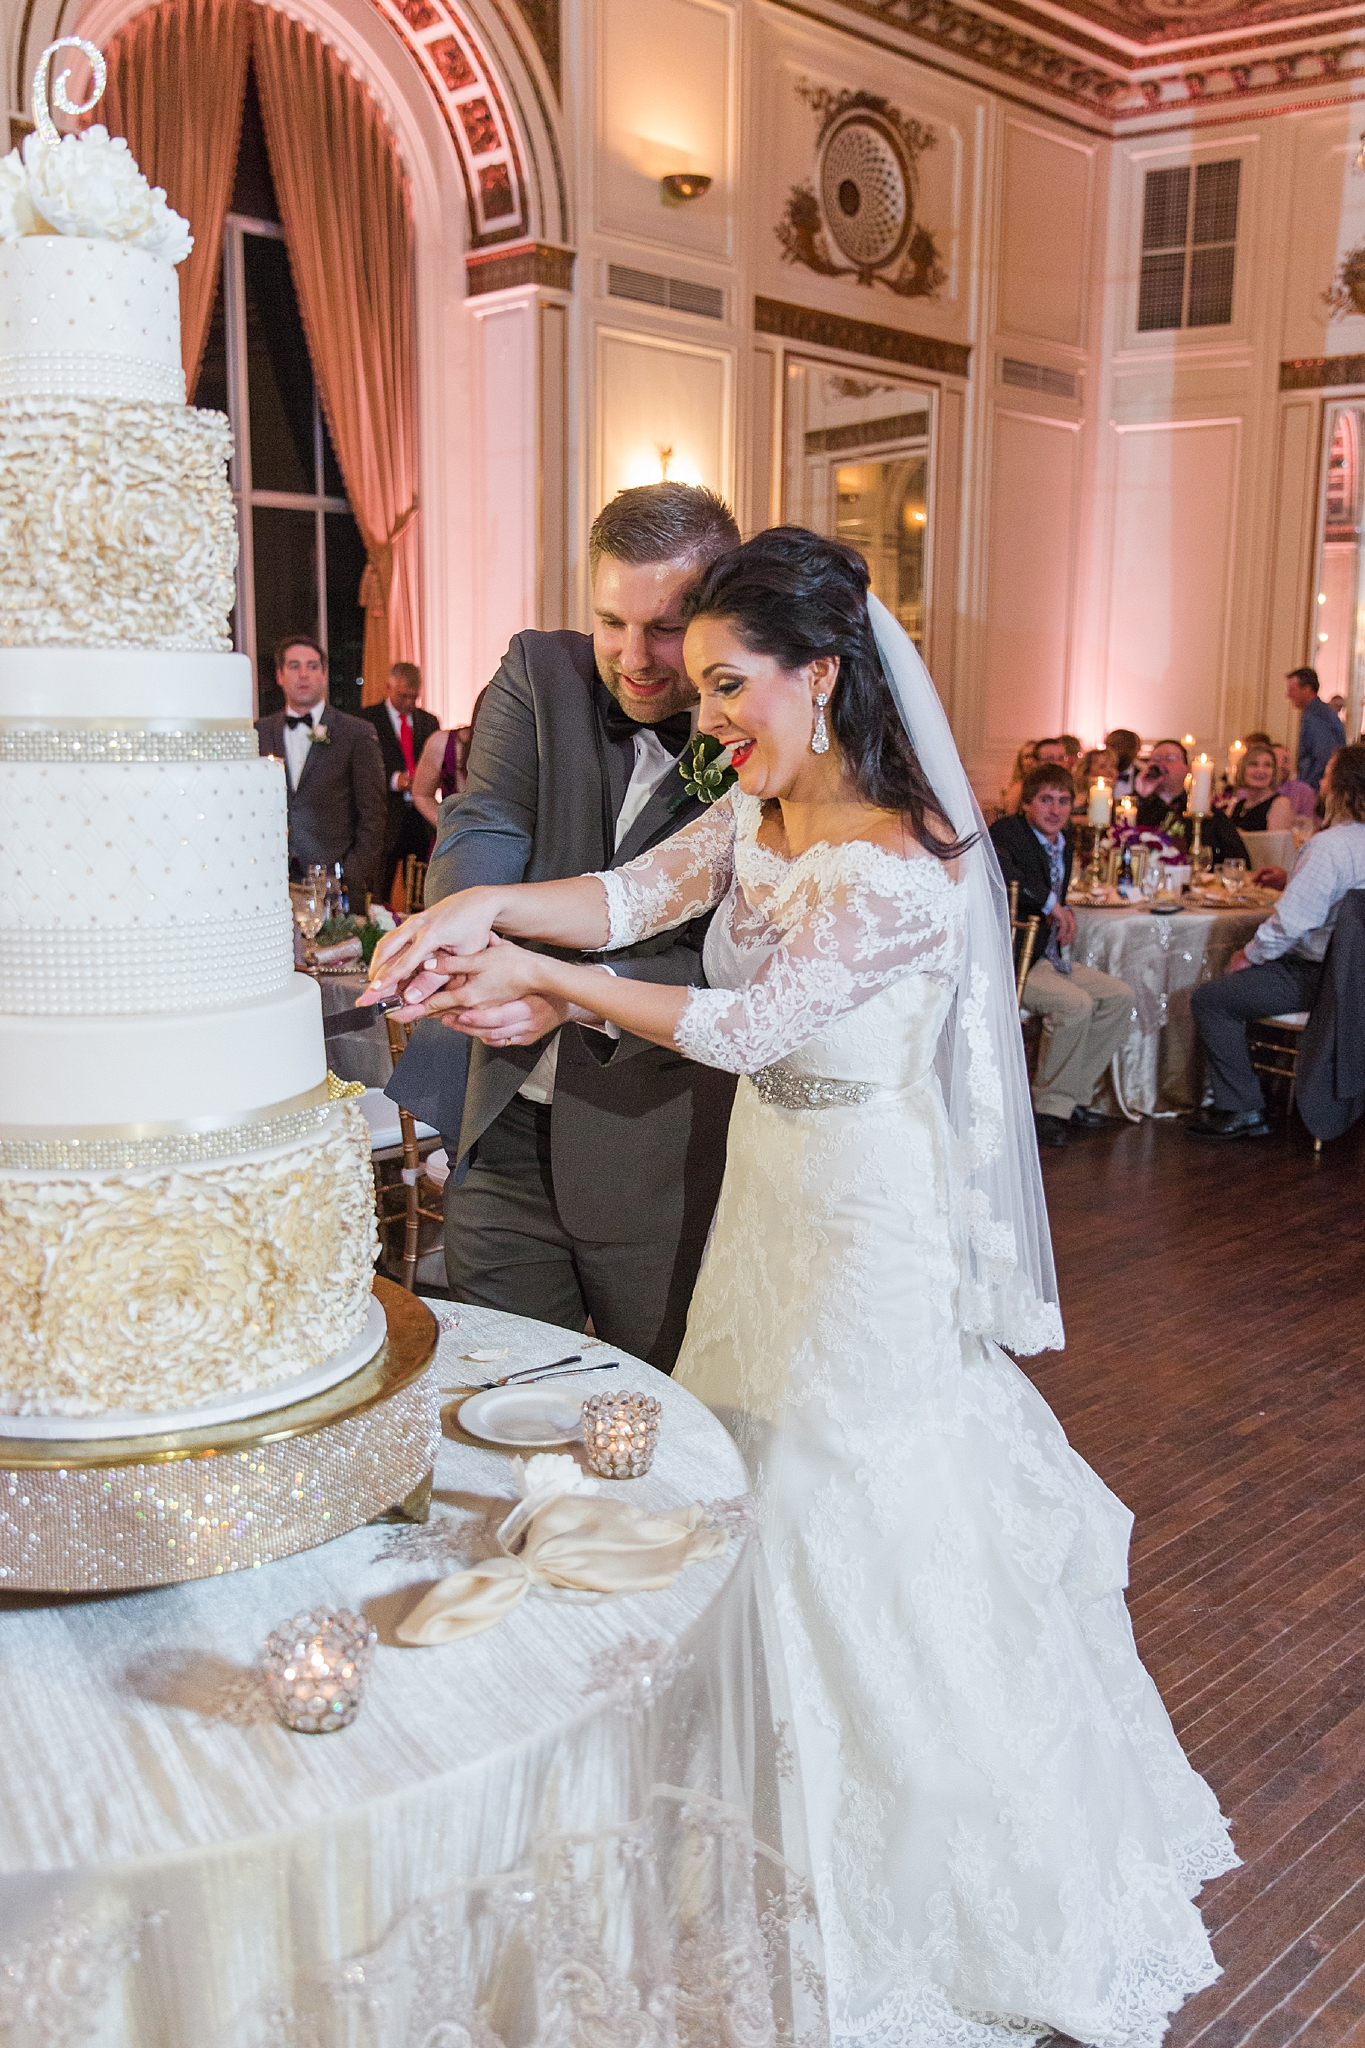 detroit-colony-club-wedding-regal-romantic-photography-in-detroit-mi-by-courtney-carolyn-photography_0037.jpg